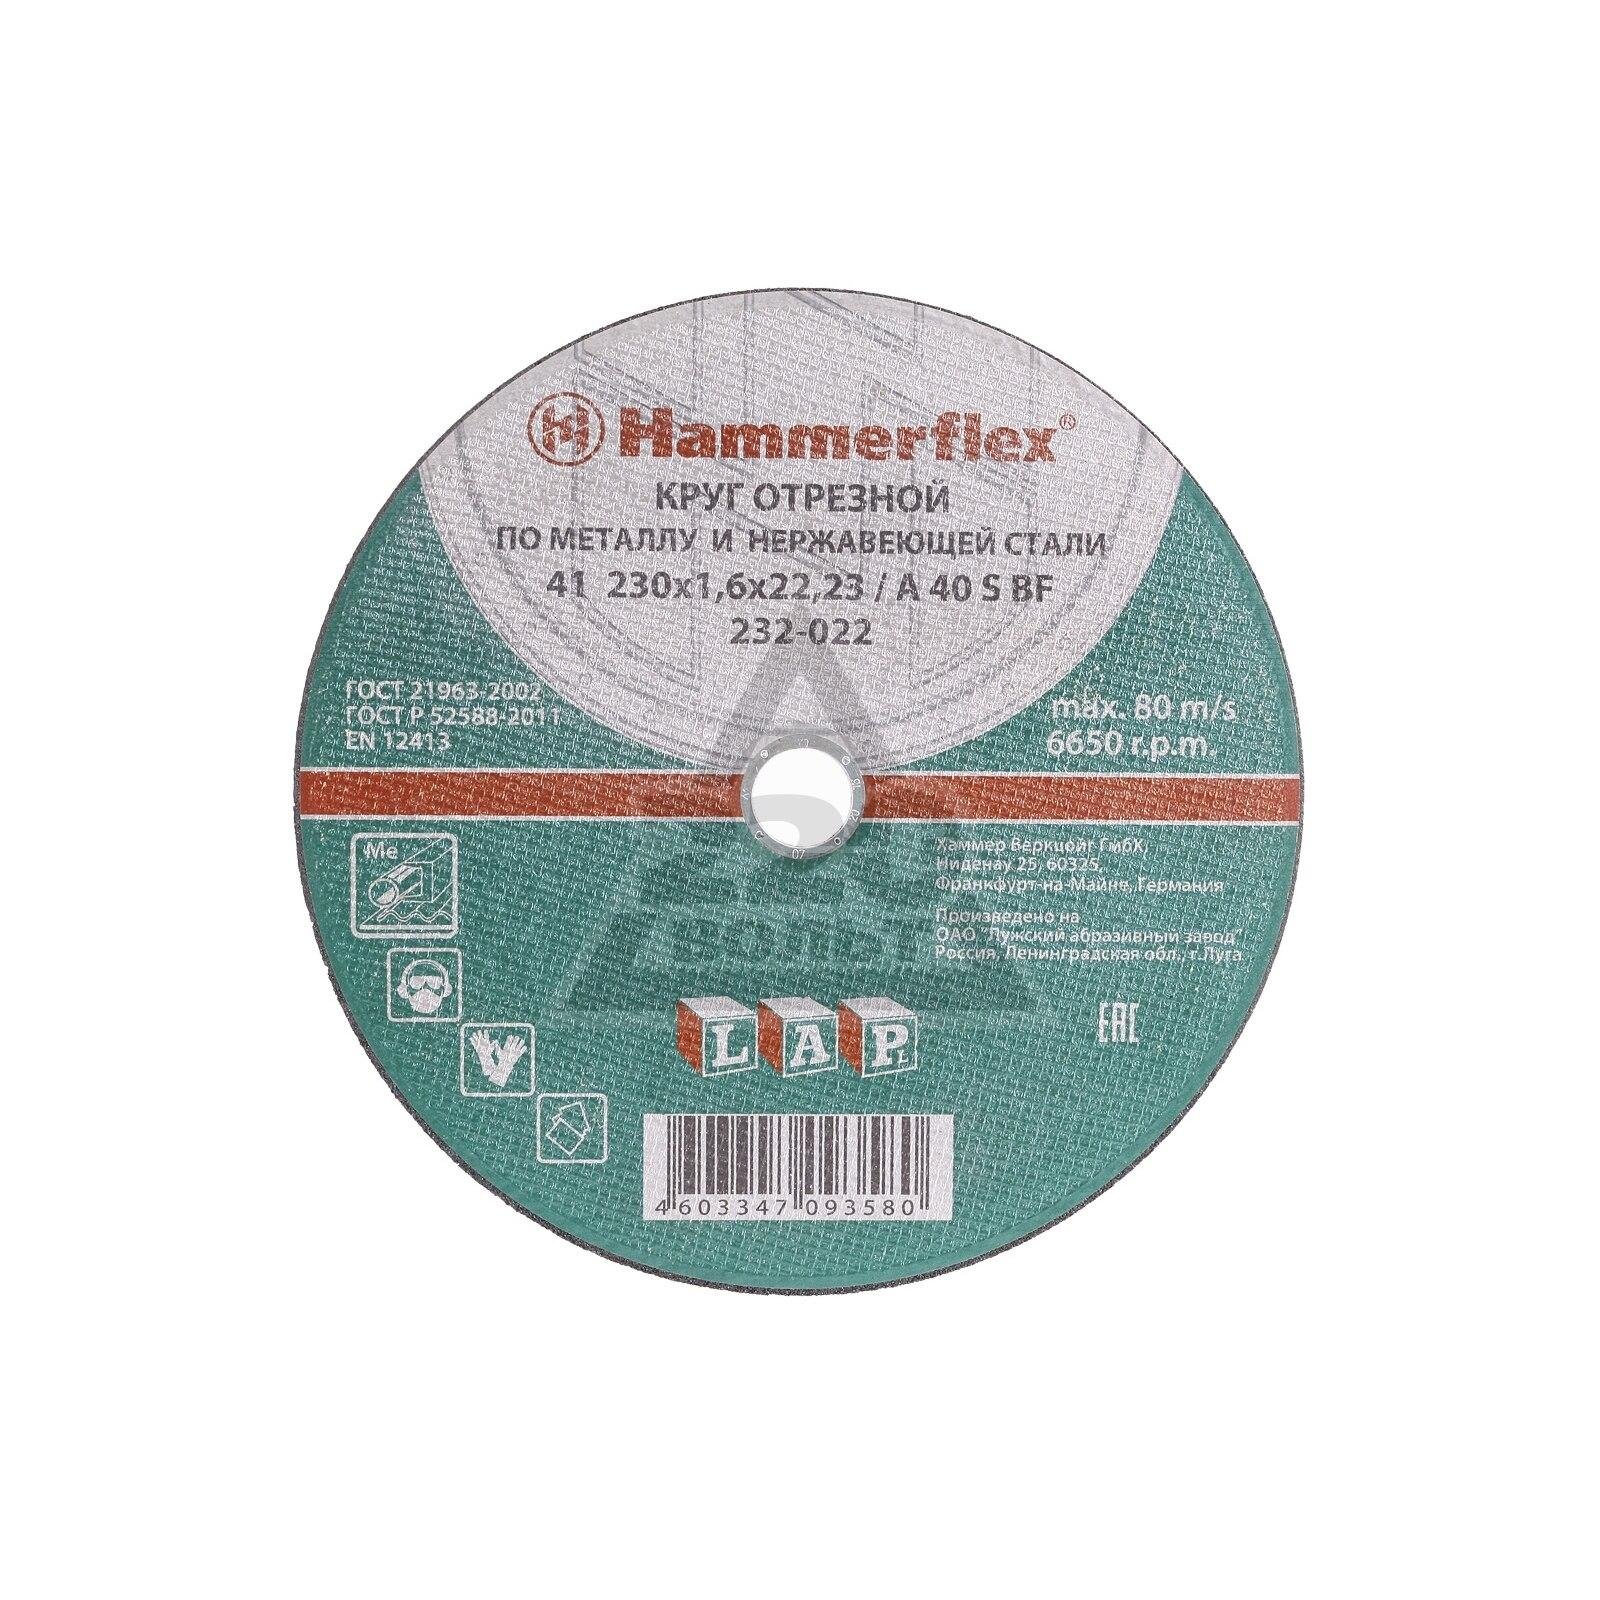 Circle Cutting HAMMER 230х1. 6x22 Pcs. 25 Pcs